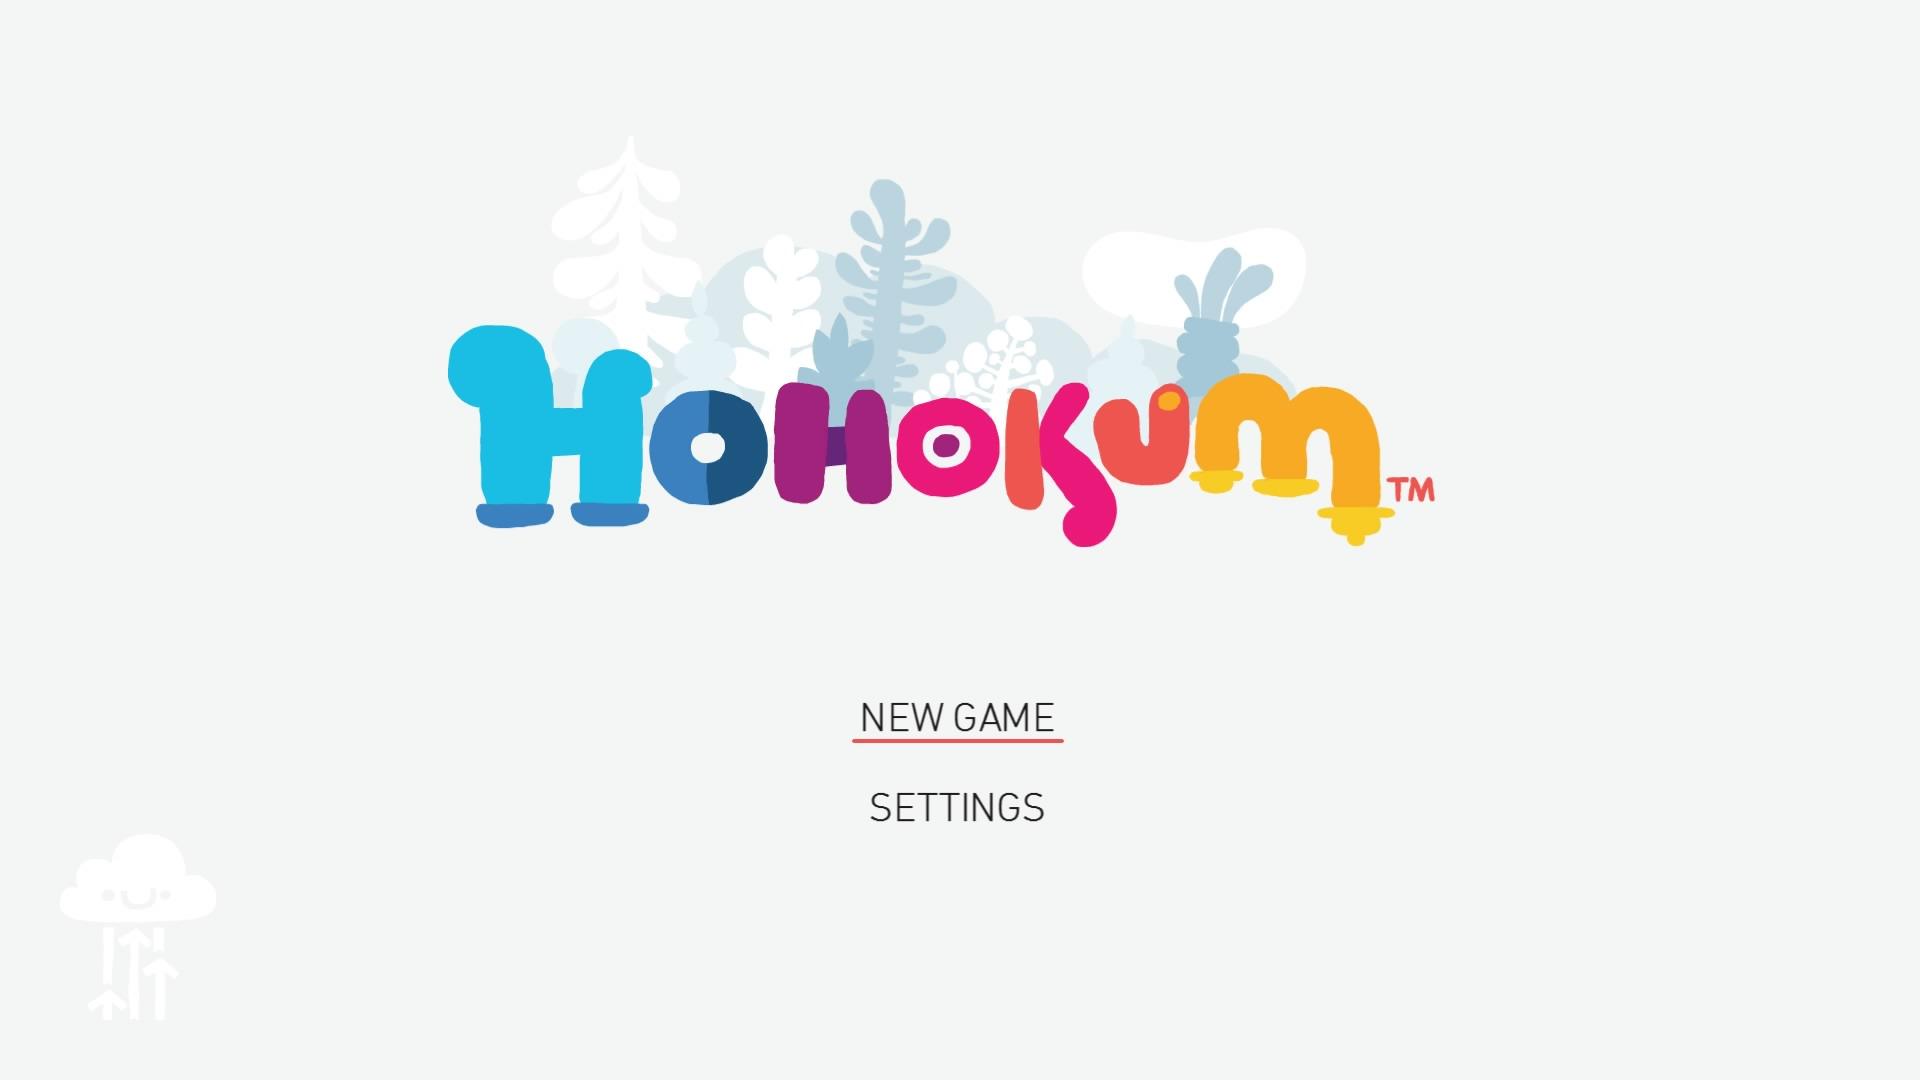 Hohokum_20150511181758.jpg